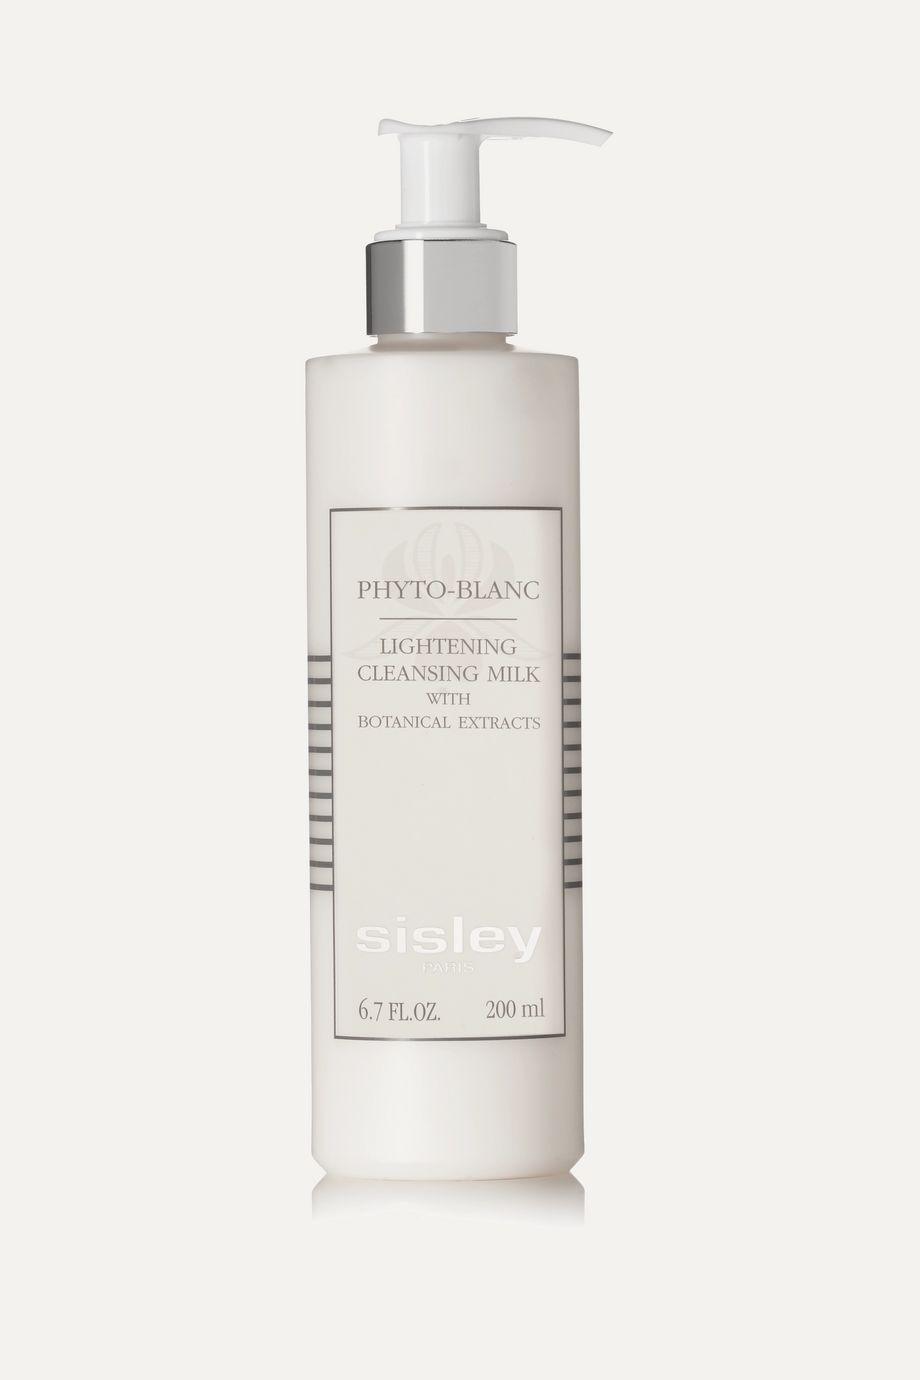 Sisley Phyto-Blanc Lightening Cleansing Milk, 200 ml – Reinigungsmilch